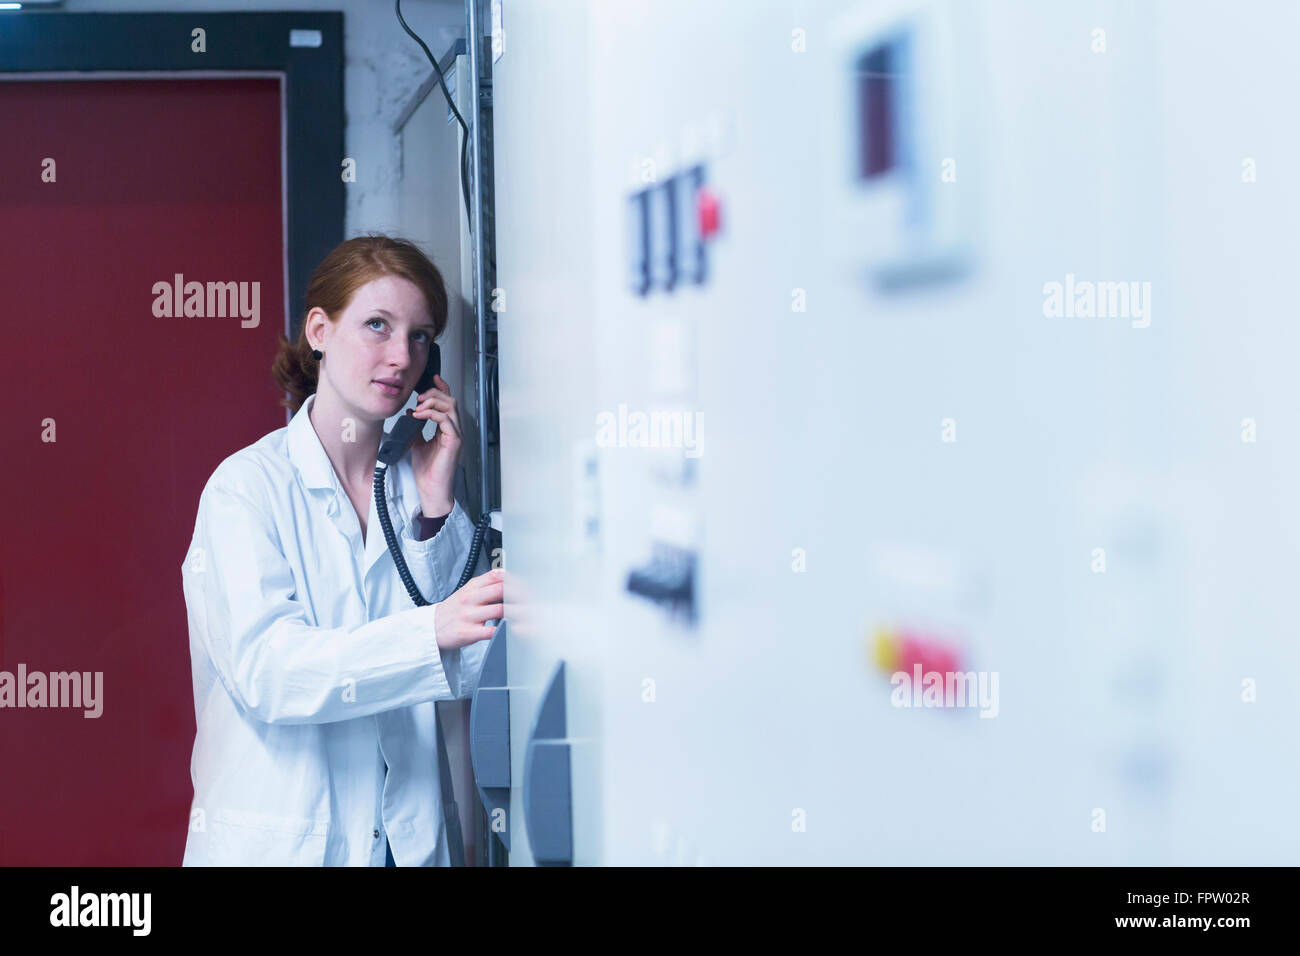 Young female engineer talking on landline phone in control room, Freiburg Im Breisgau, Baden-Württemberg, Germany - Stock Image